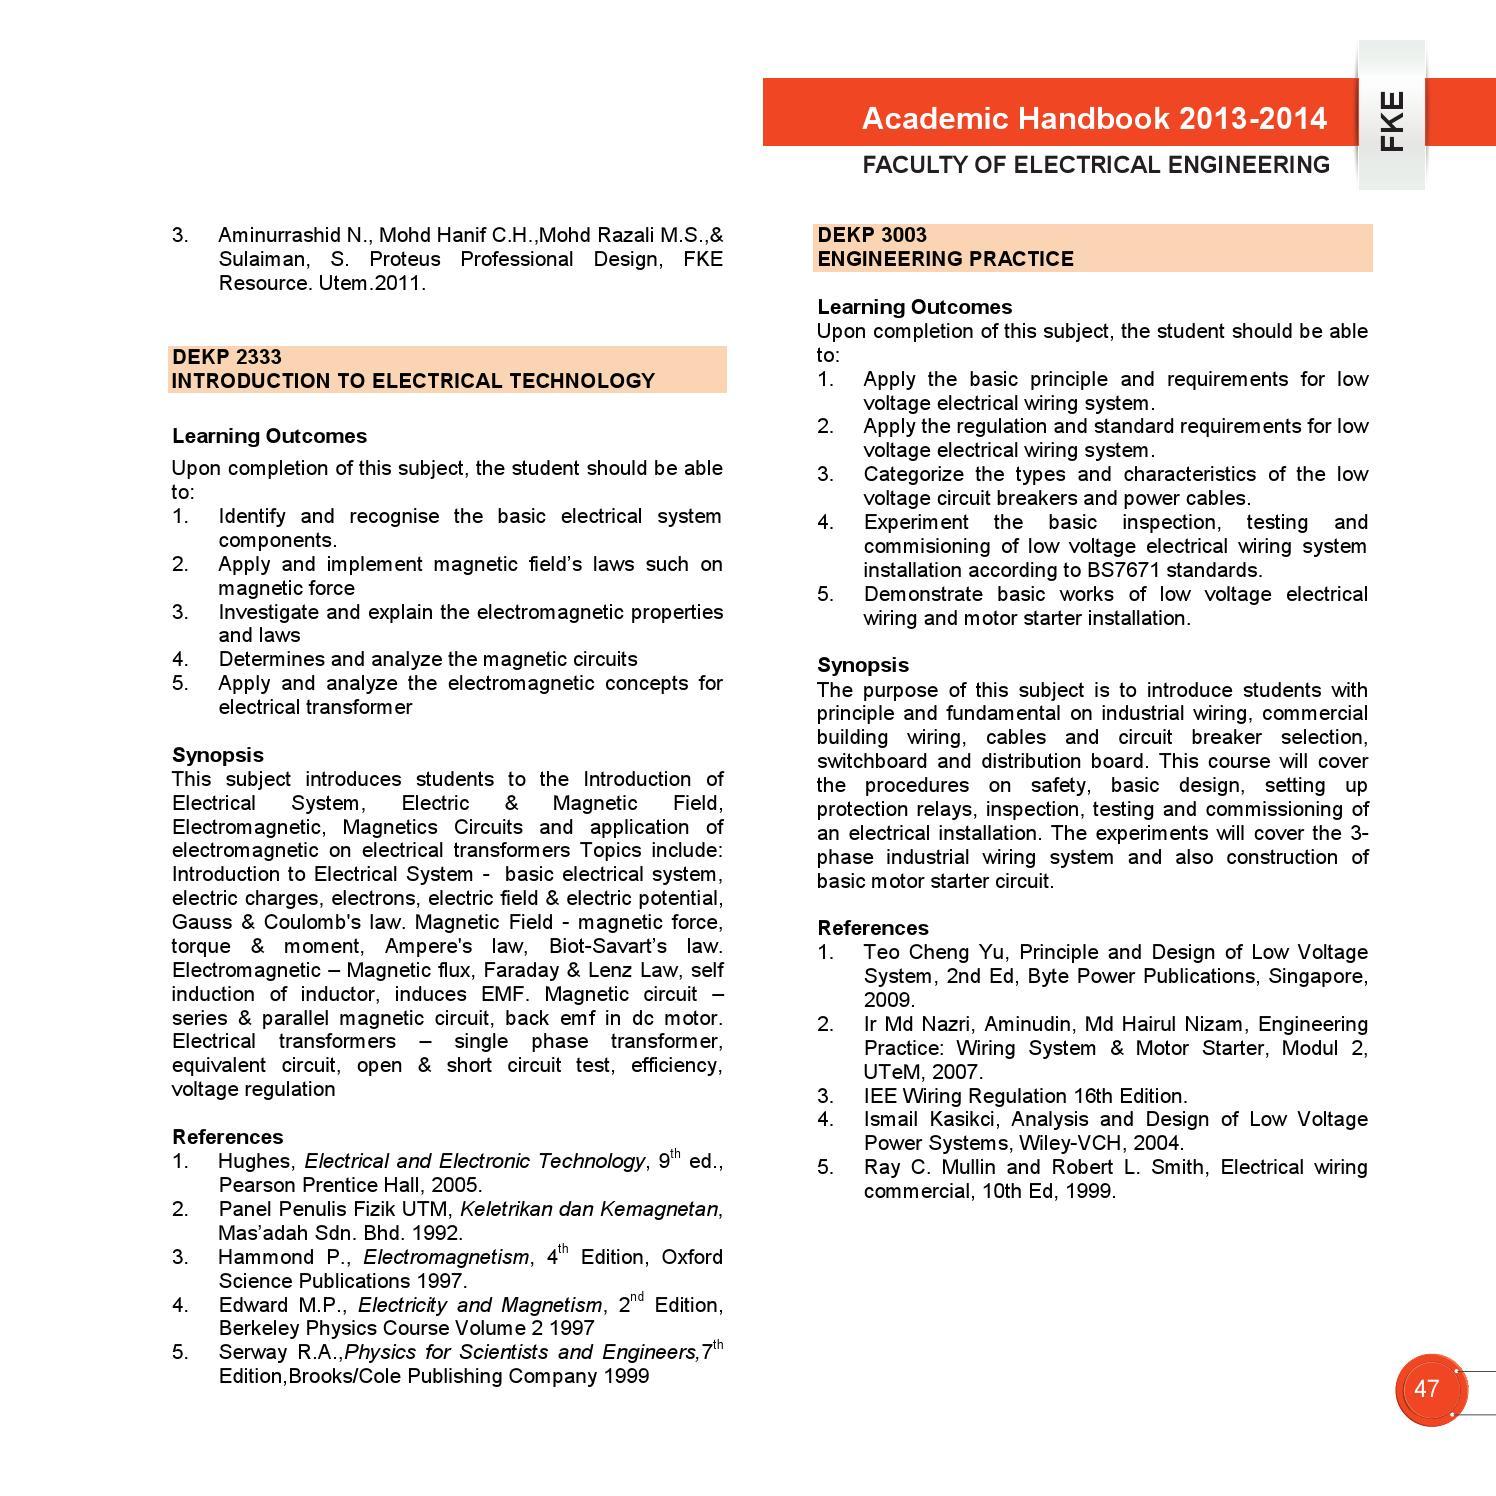 Academic Handbook FKE UTeM 2013/2014 by Vincent Loi - issuu